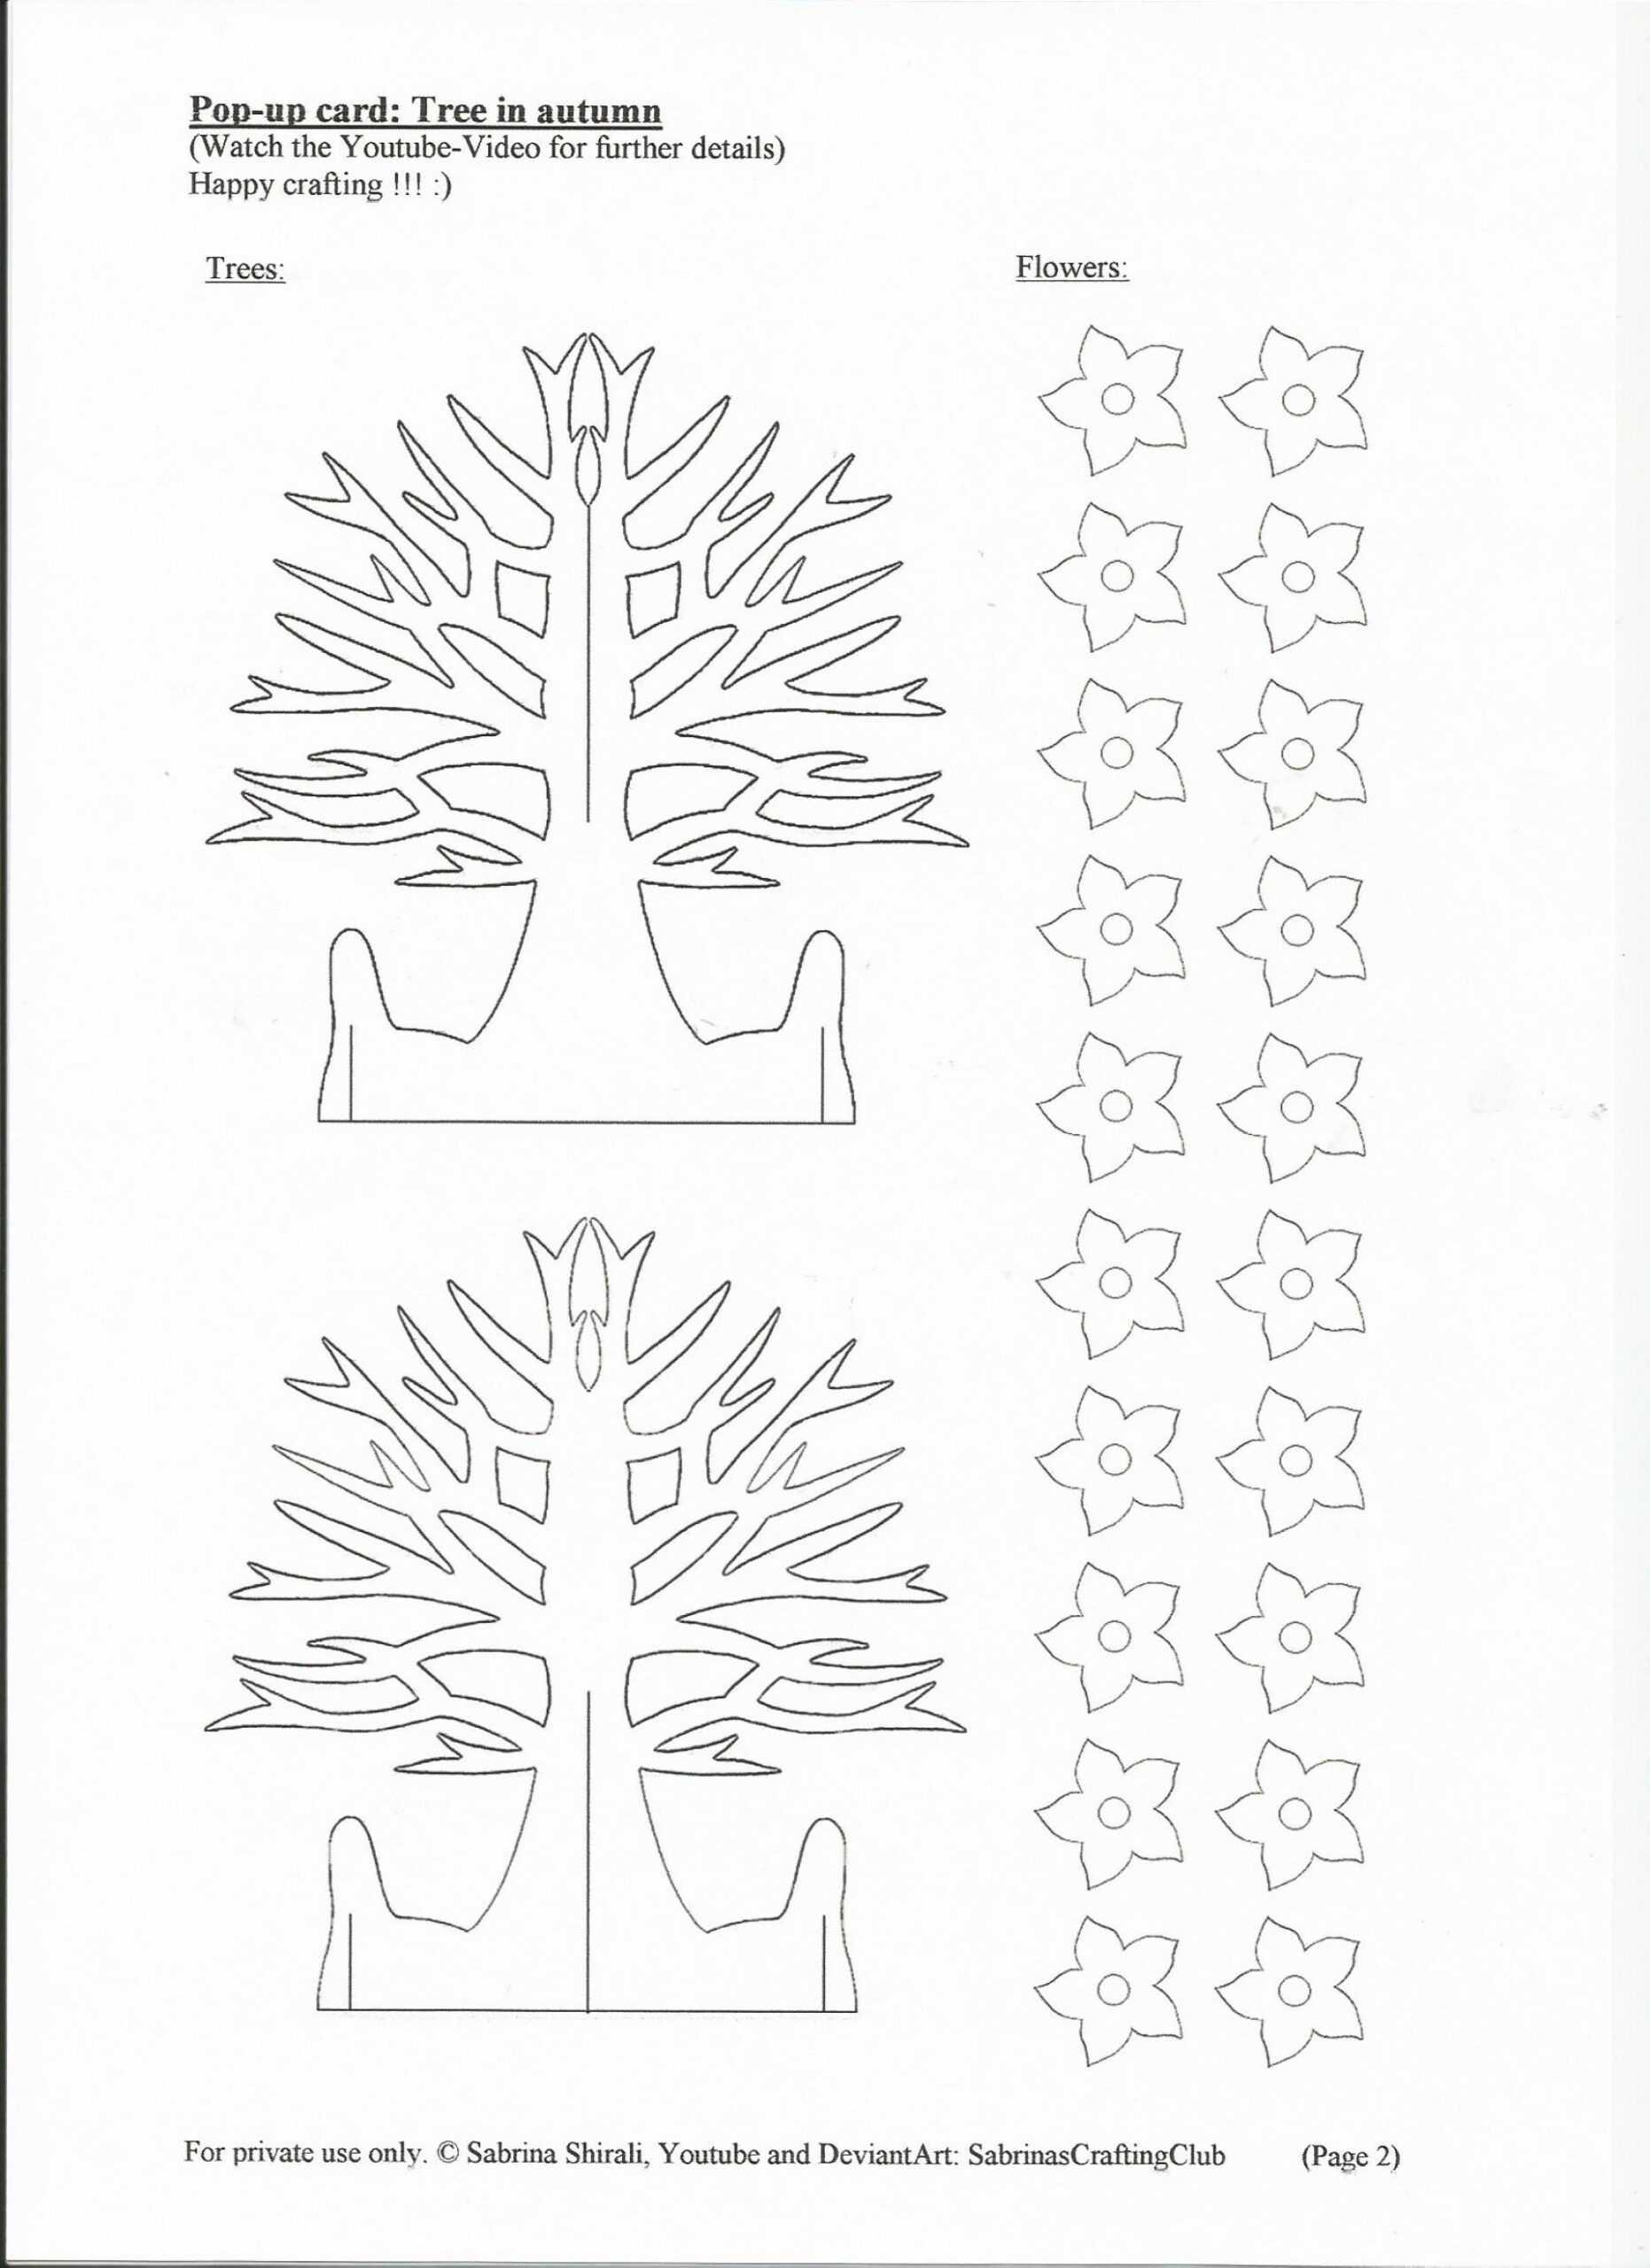 027 84614 10951579724 9338E5D5 Dca2 4412 9F59 413344C84Caf Regarding Pop Up Tree Card Template